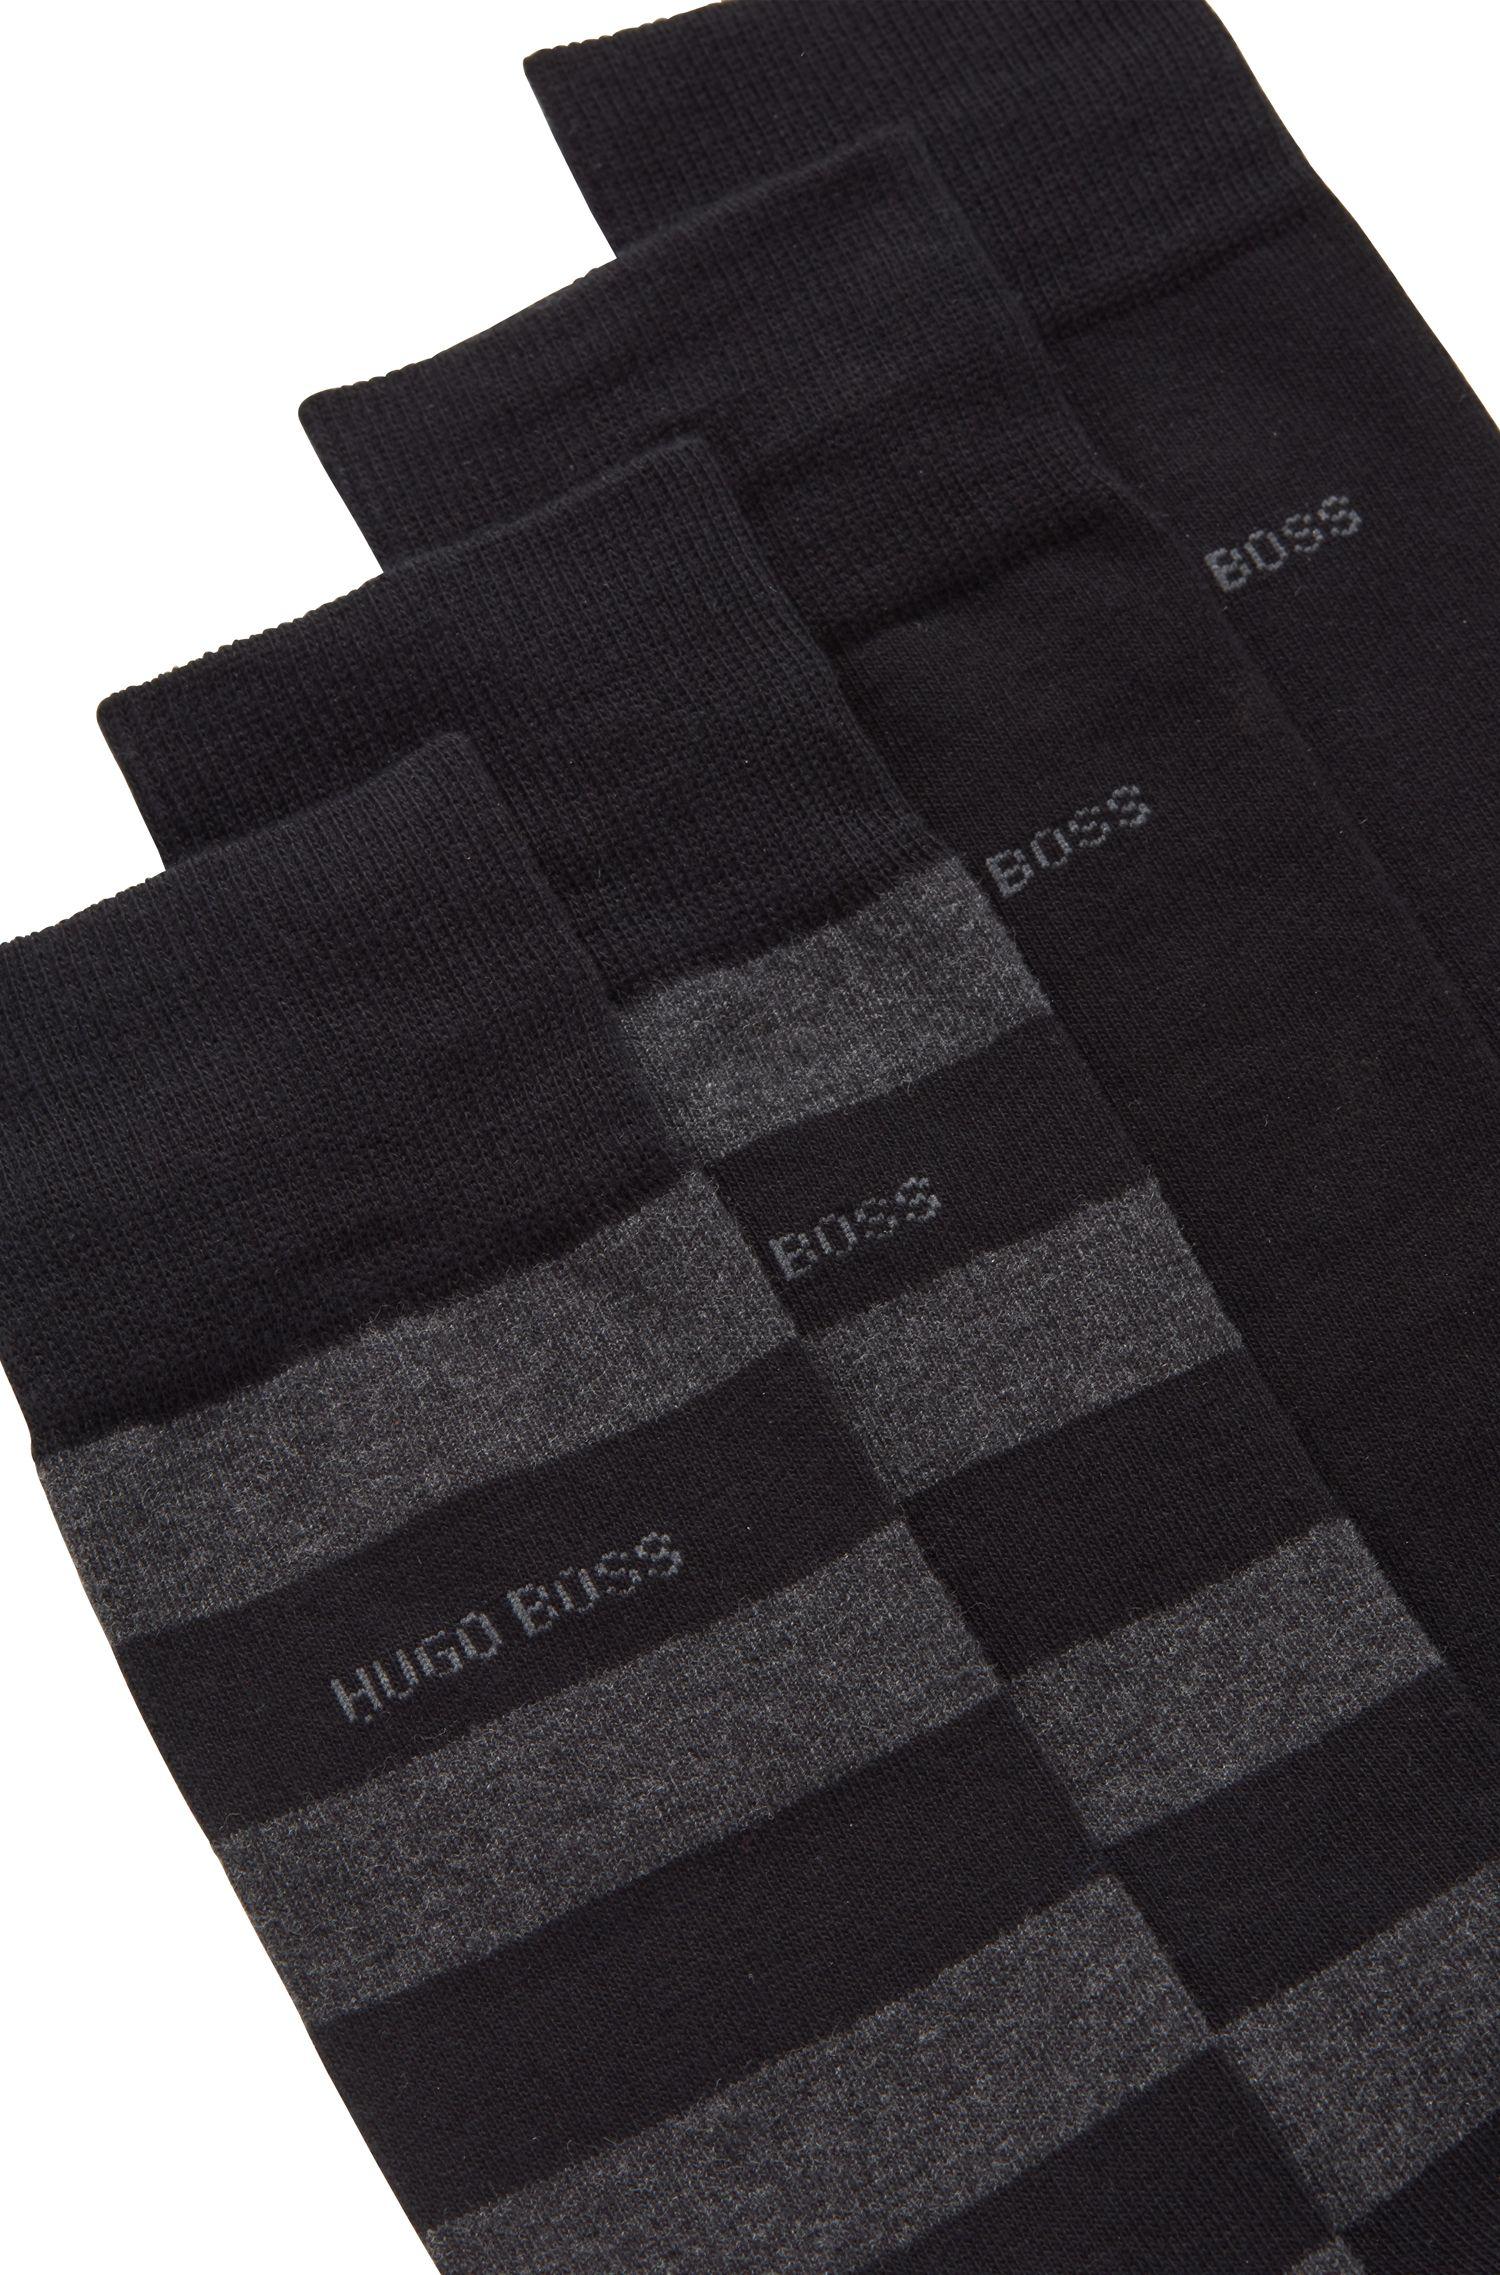 Zweier-Pack mittelhohe Socken aus gekämmtem Baumwoll-Mix, Schwarz